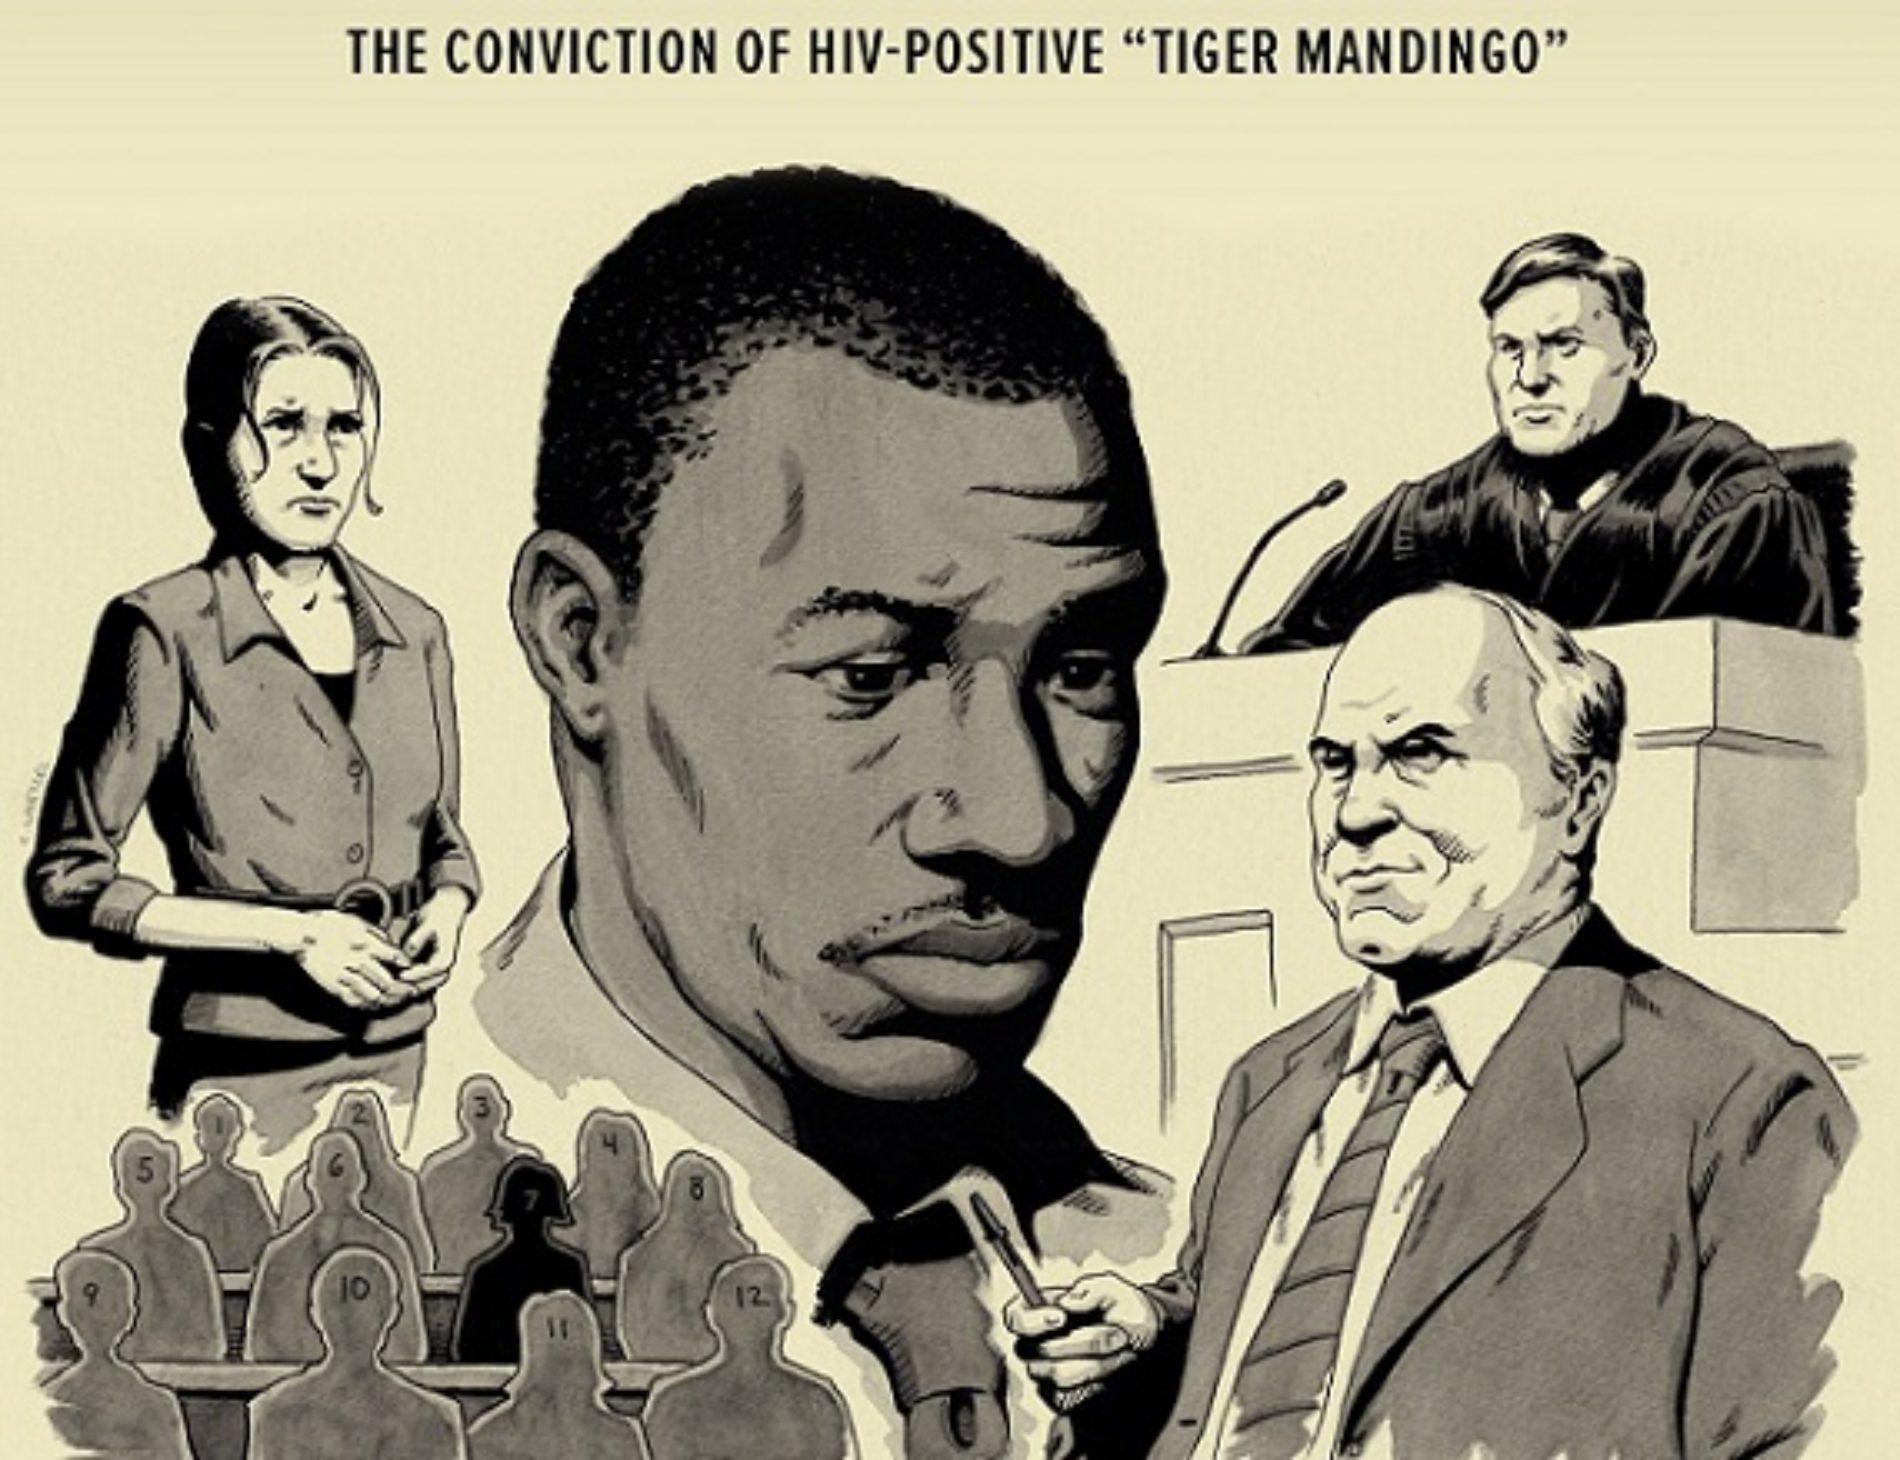 The Conviction of HIV-Positive Tiger Mandingo